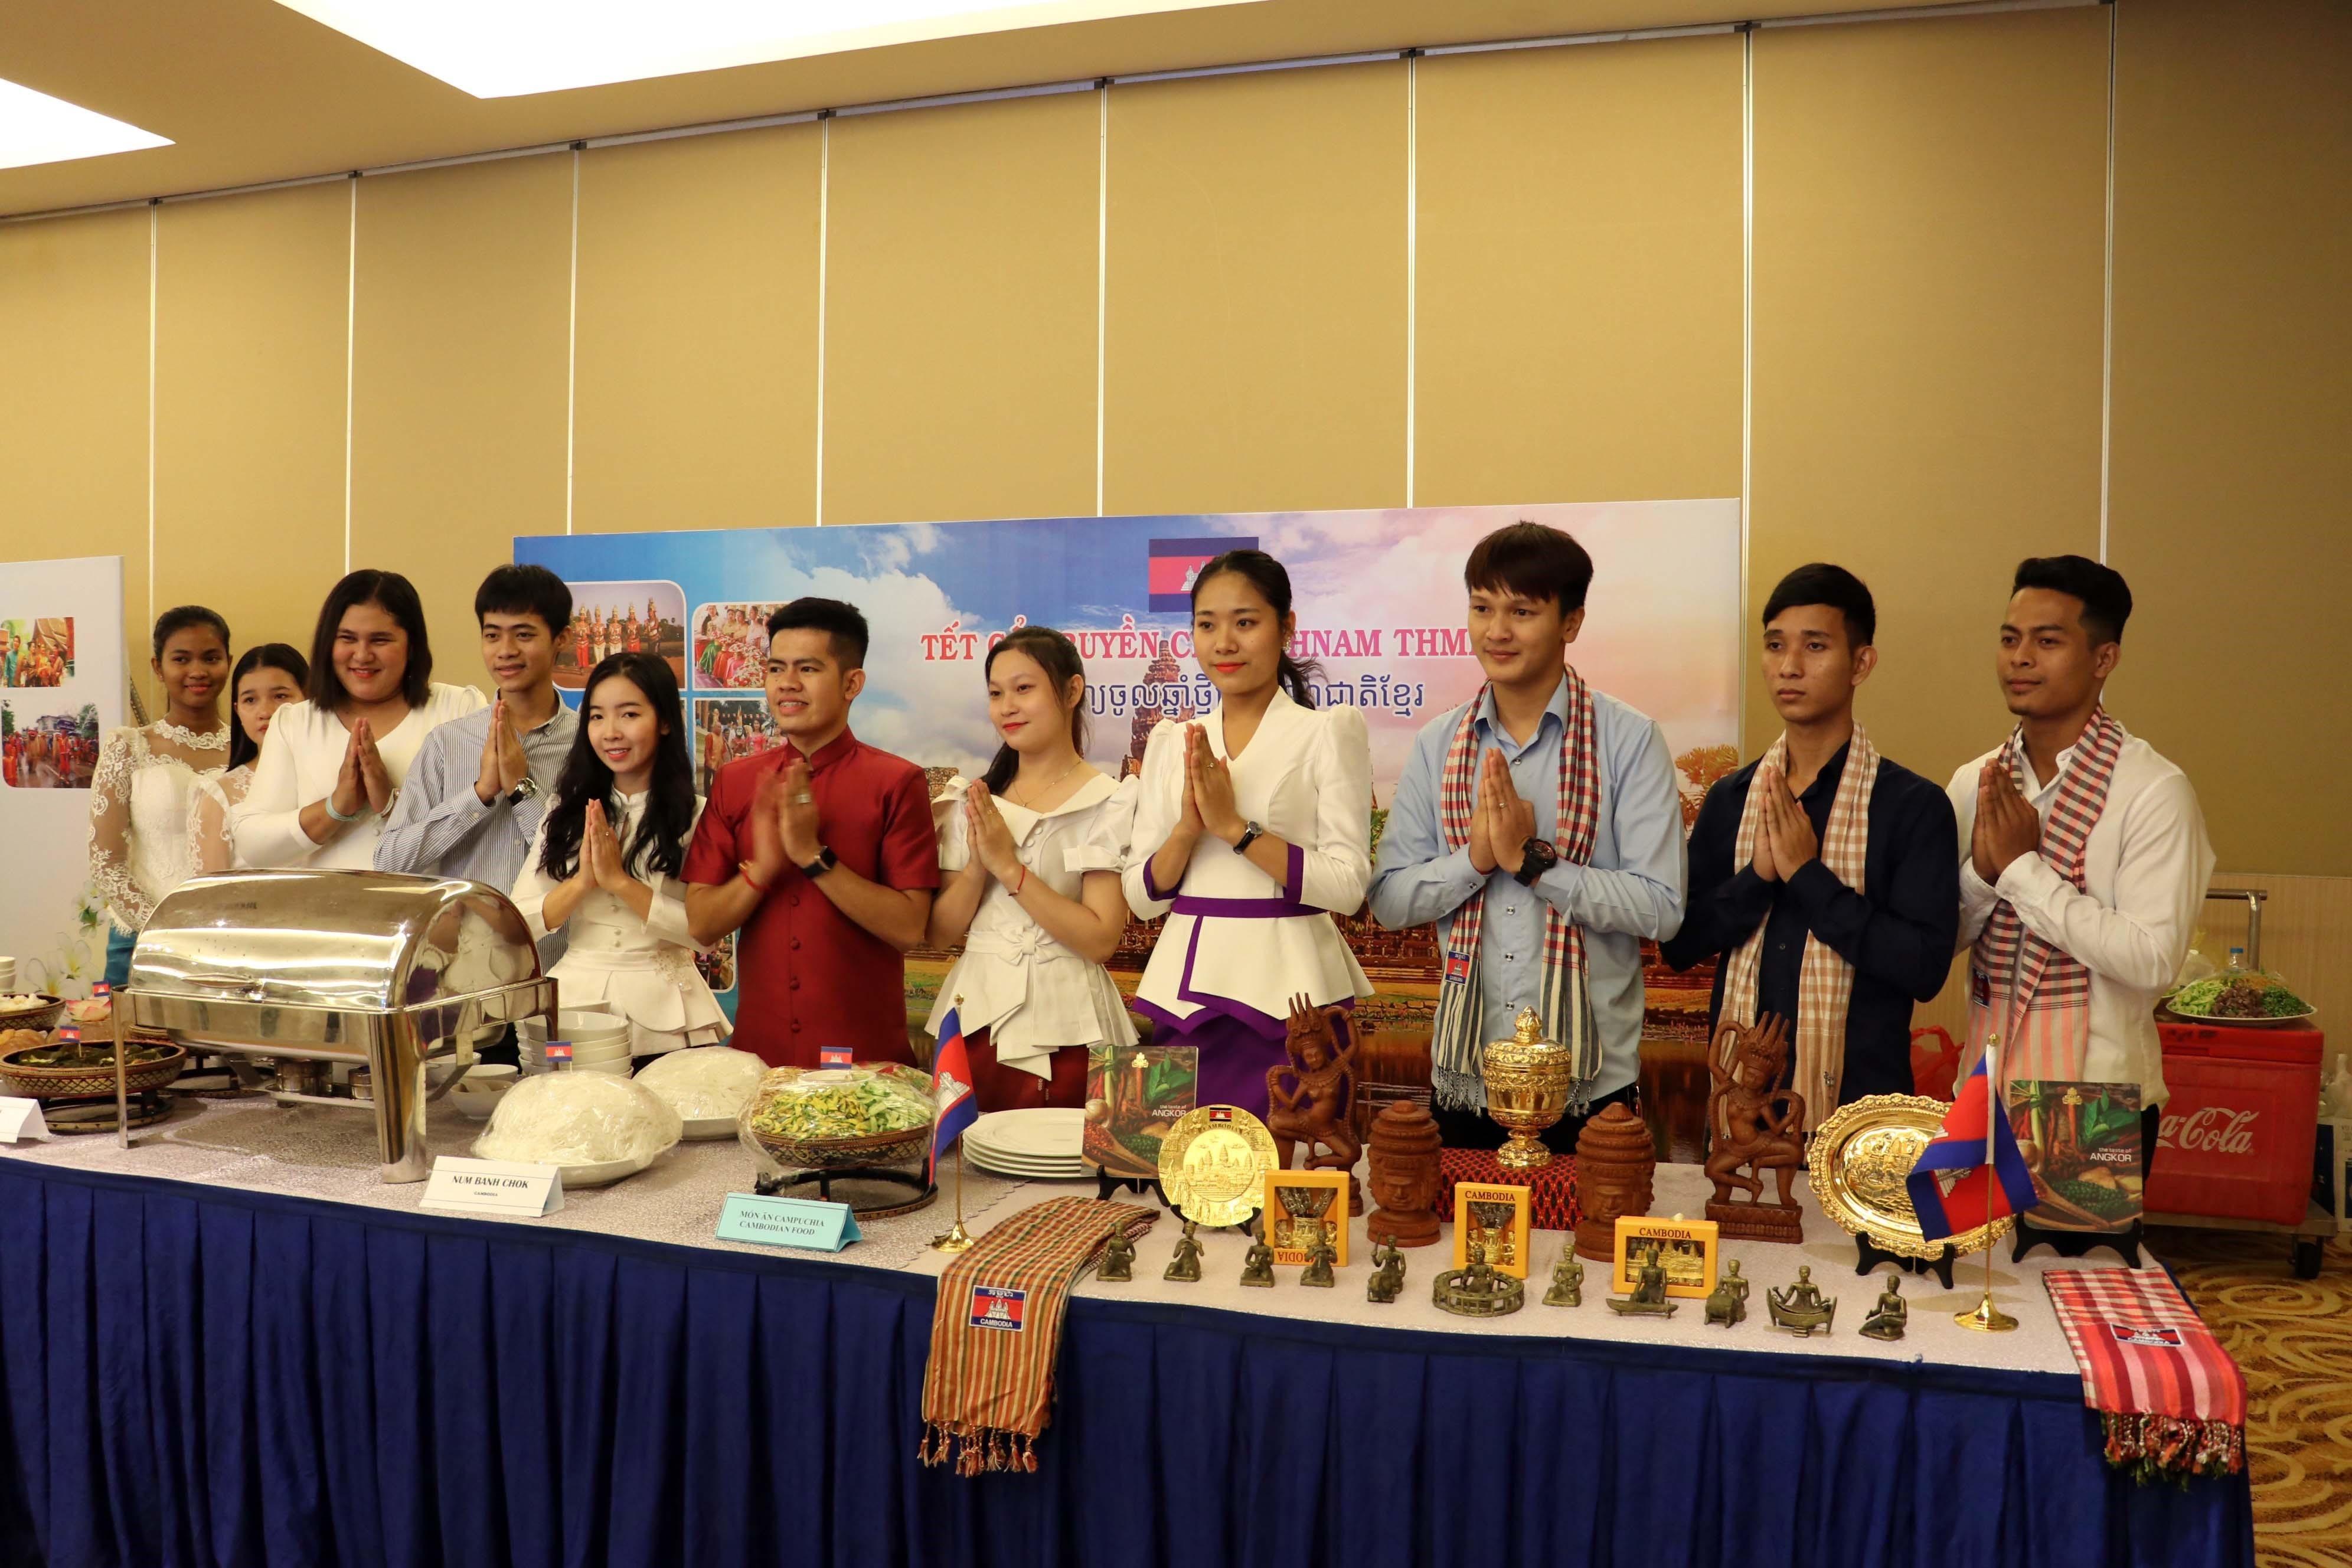 New Year for Cambodia, Laos, Thailand celebrated in Ba Ria-Vung Tau